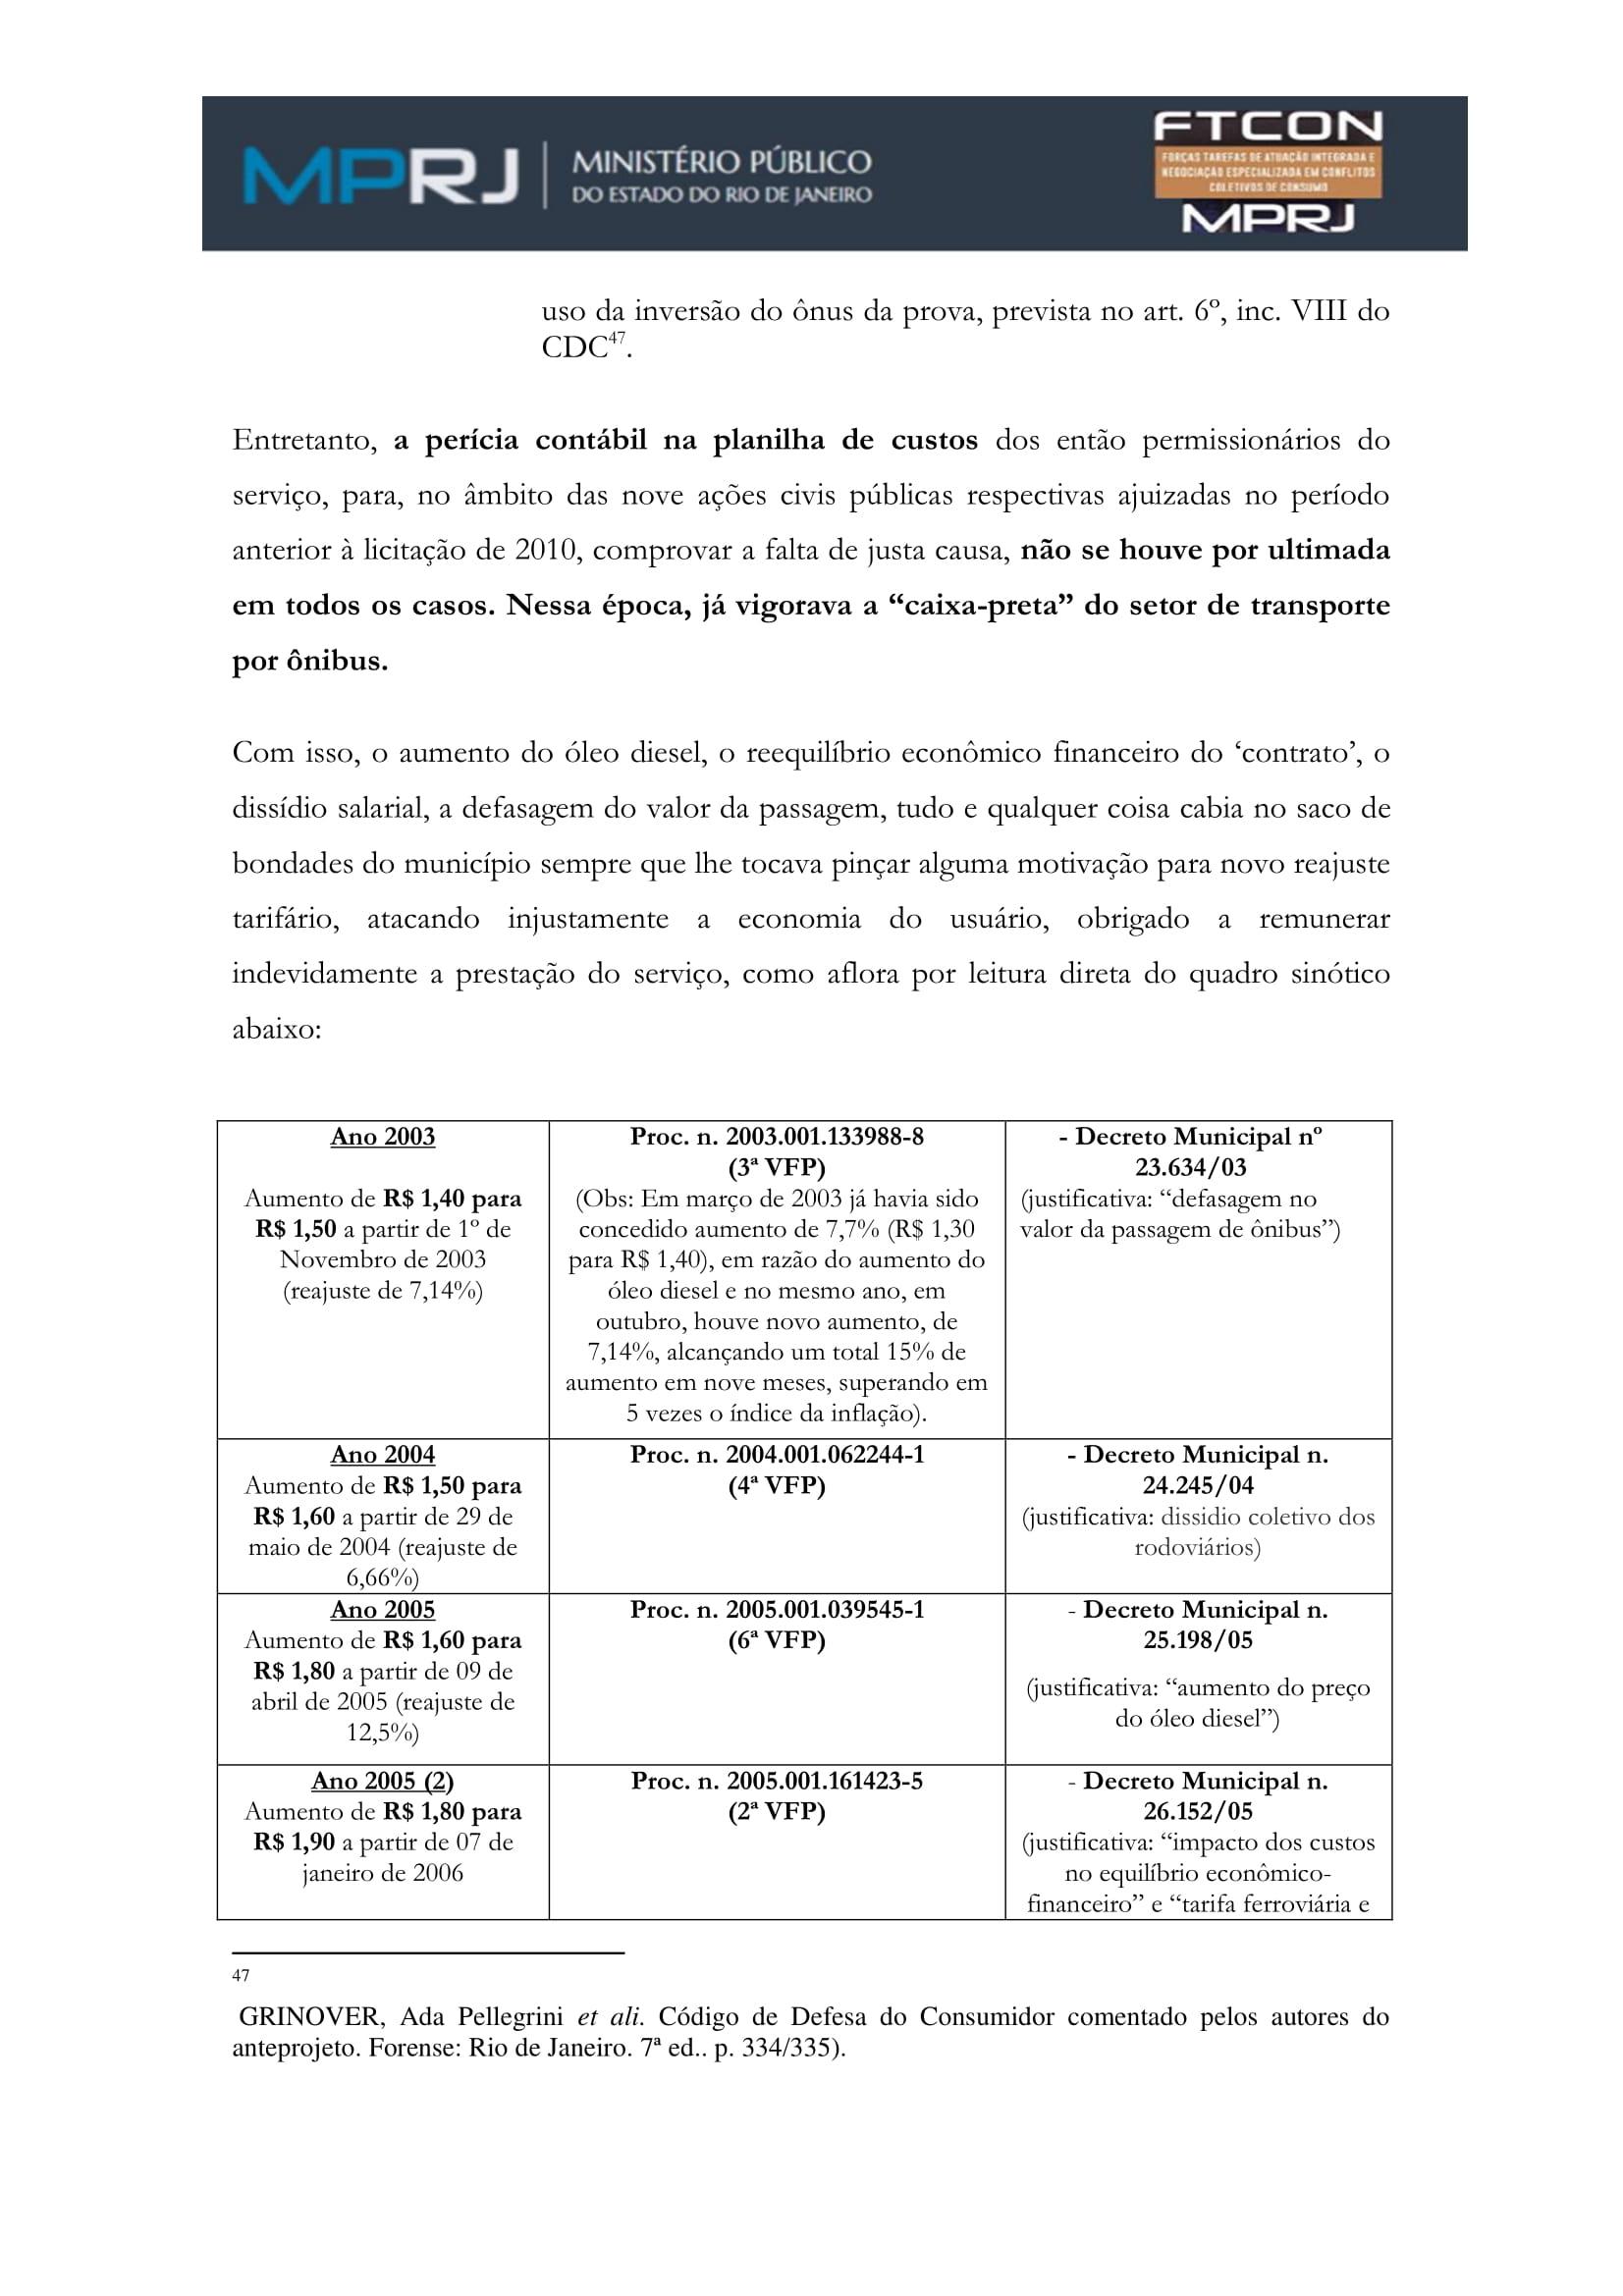 acp_caducidade_onibus_dr_rt-062